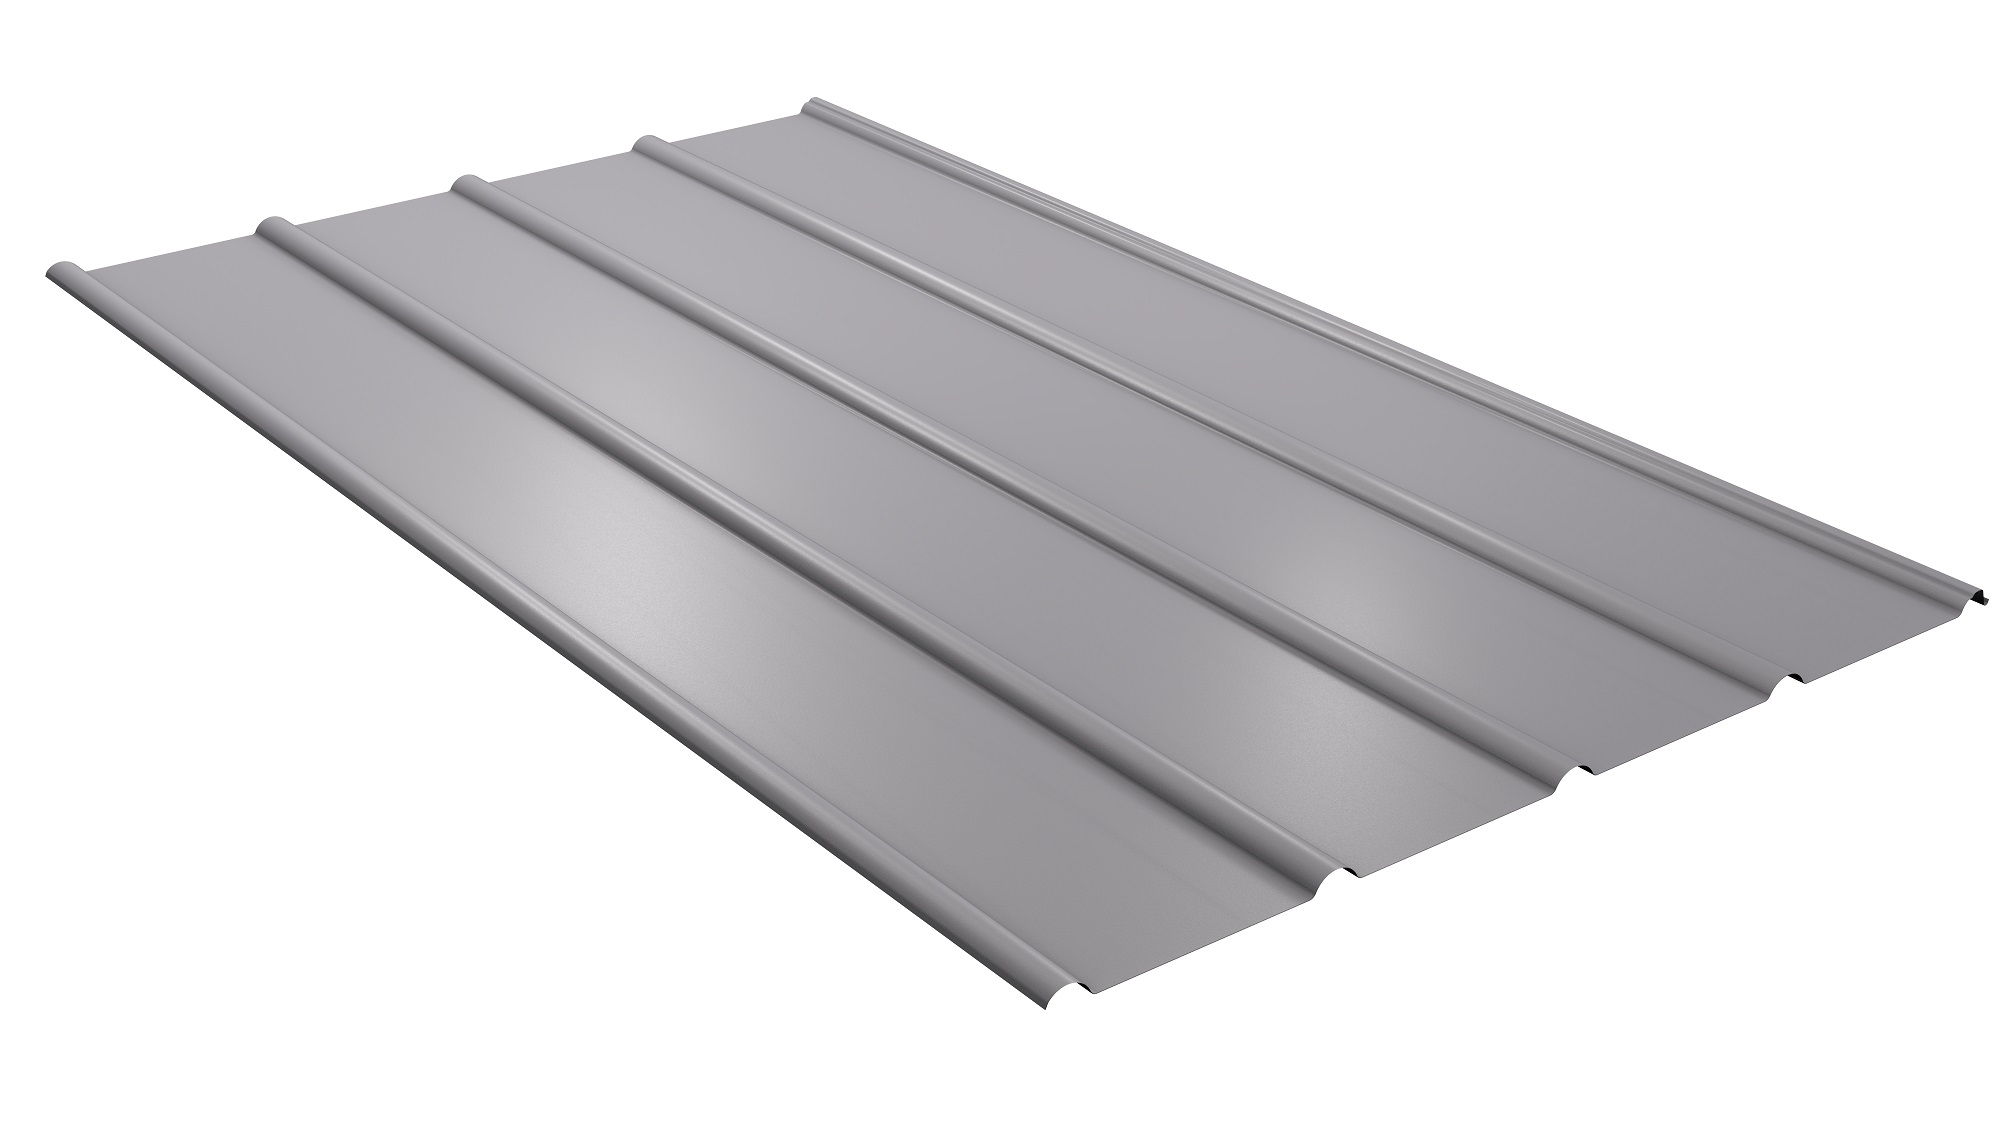 Pannplåt Design Mörk Silvermetallic